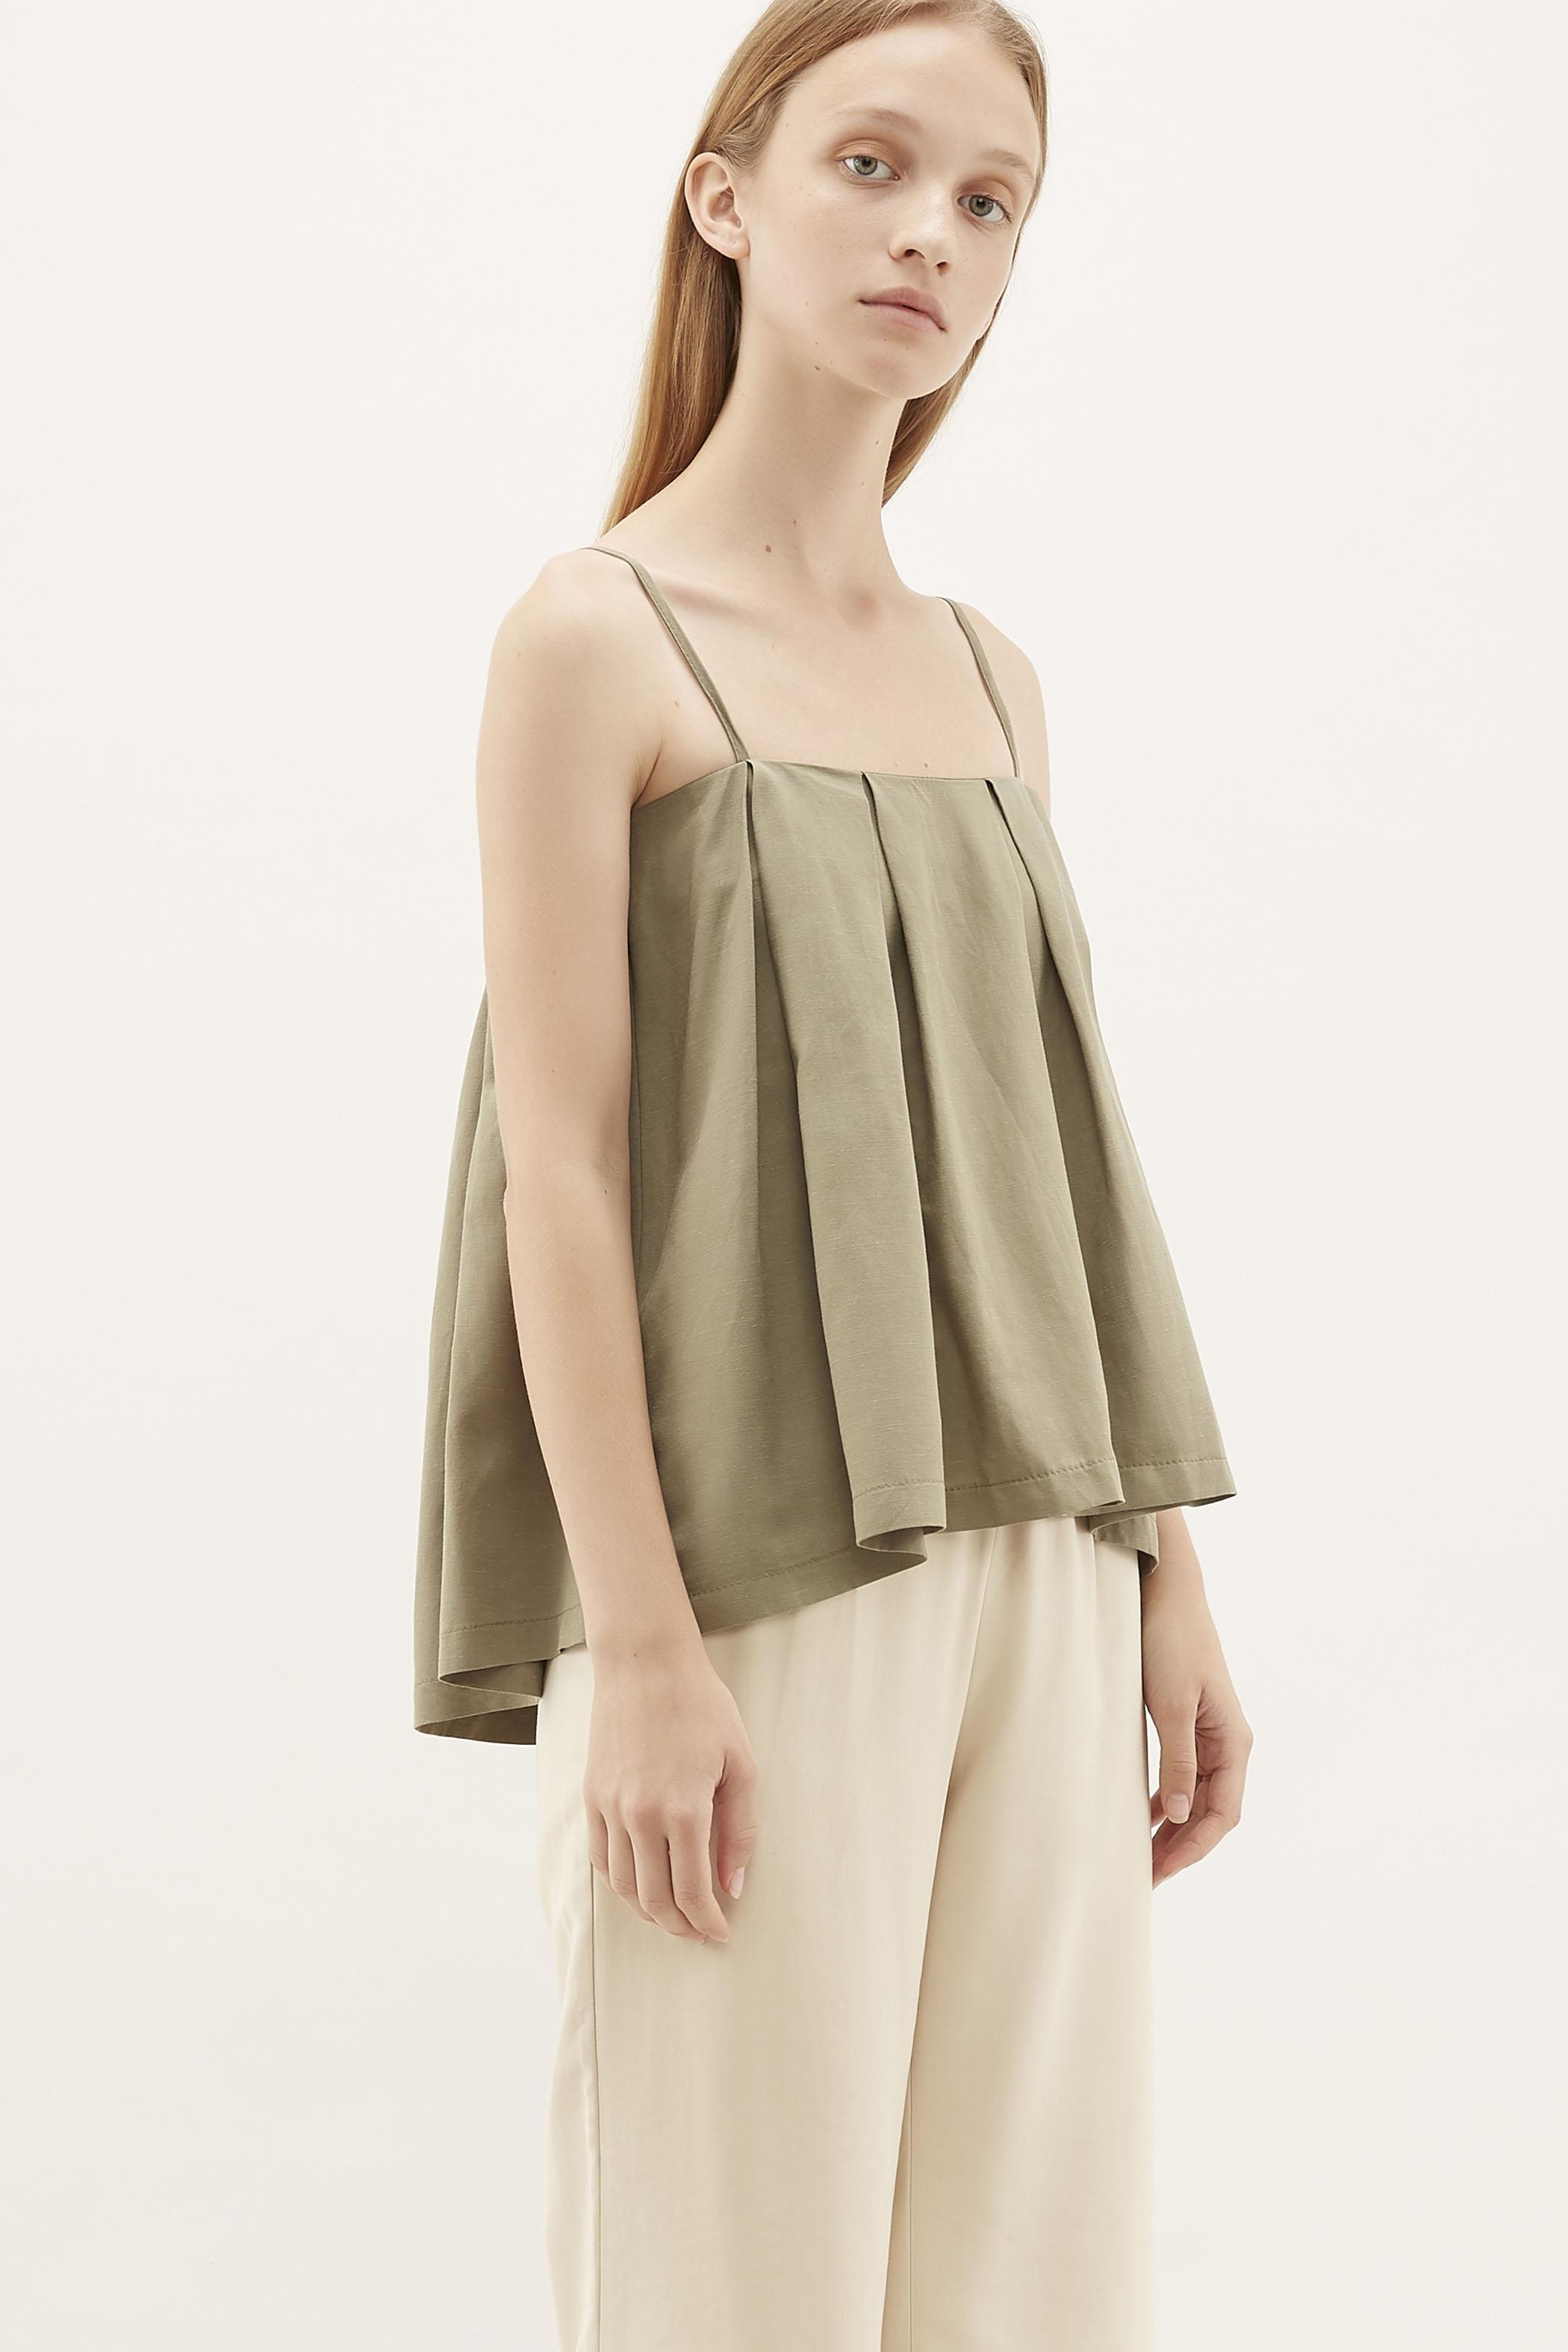 Liron Pleated Camisole